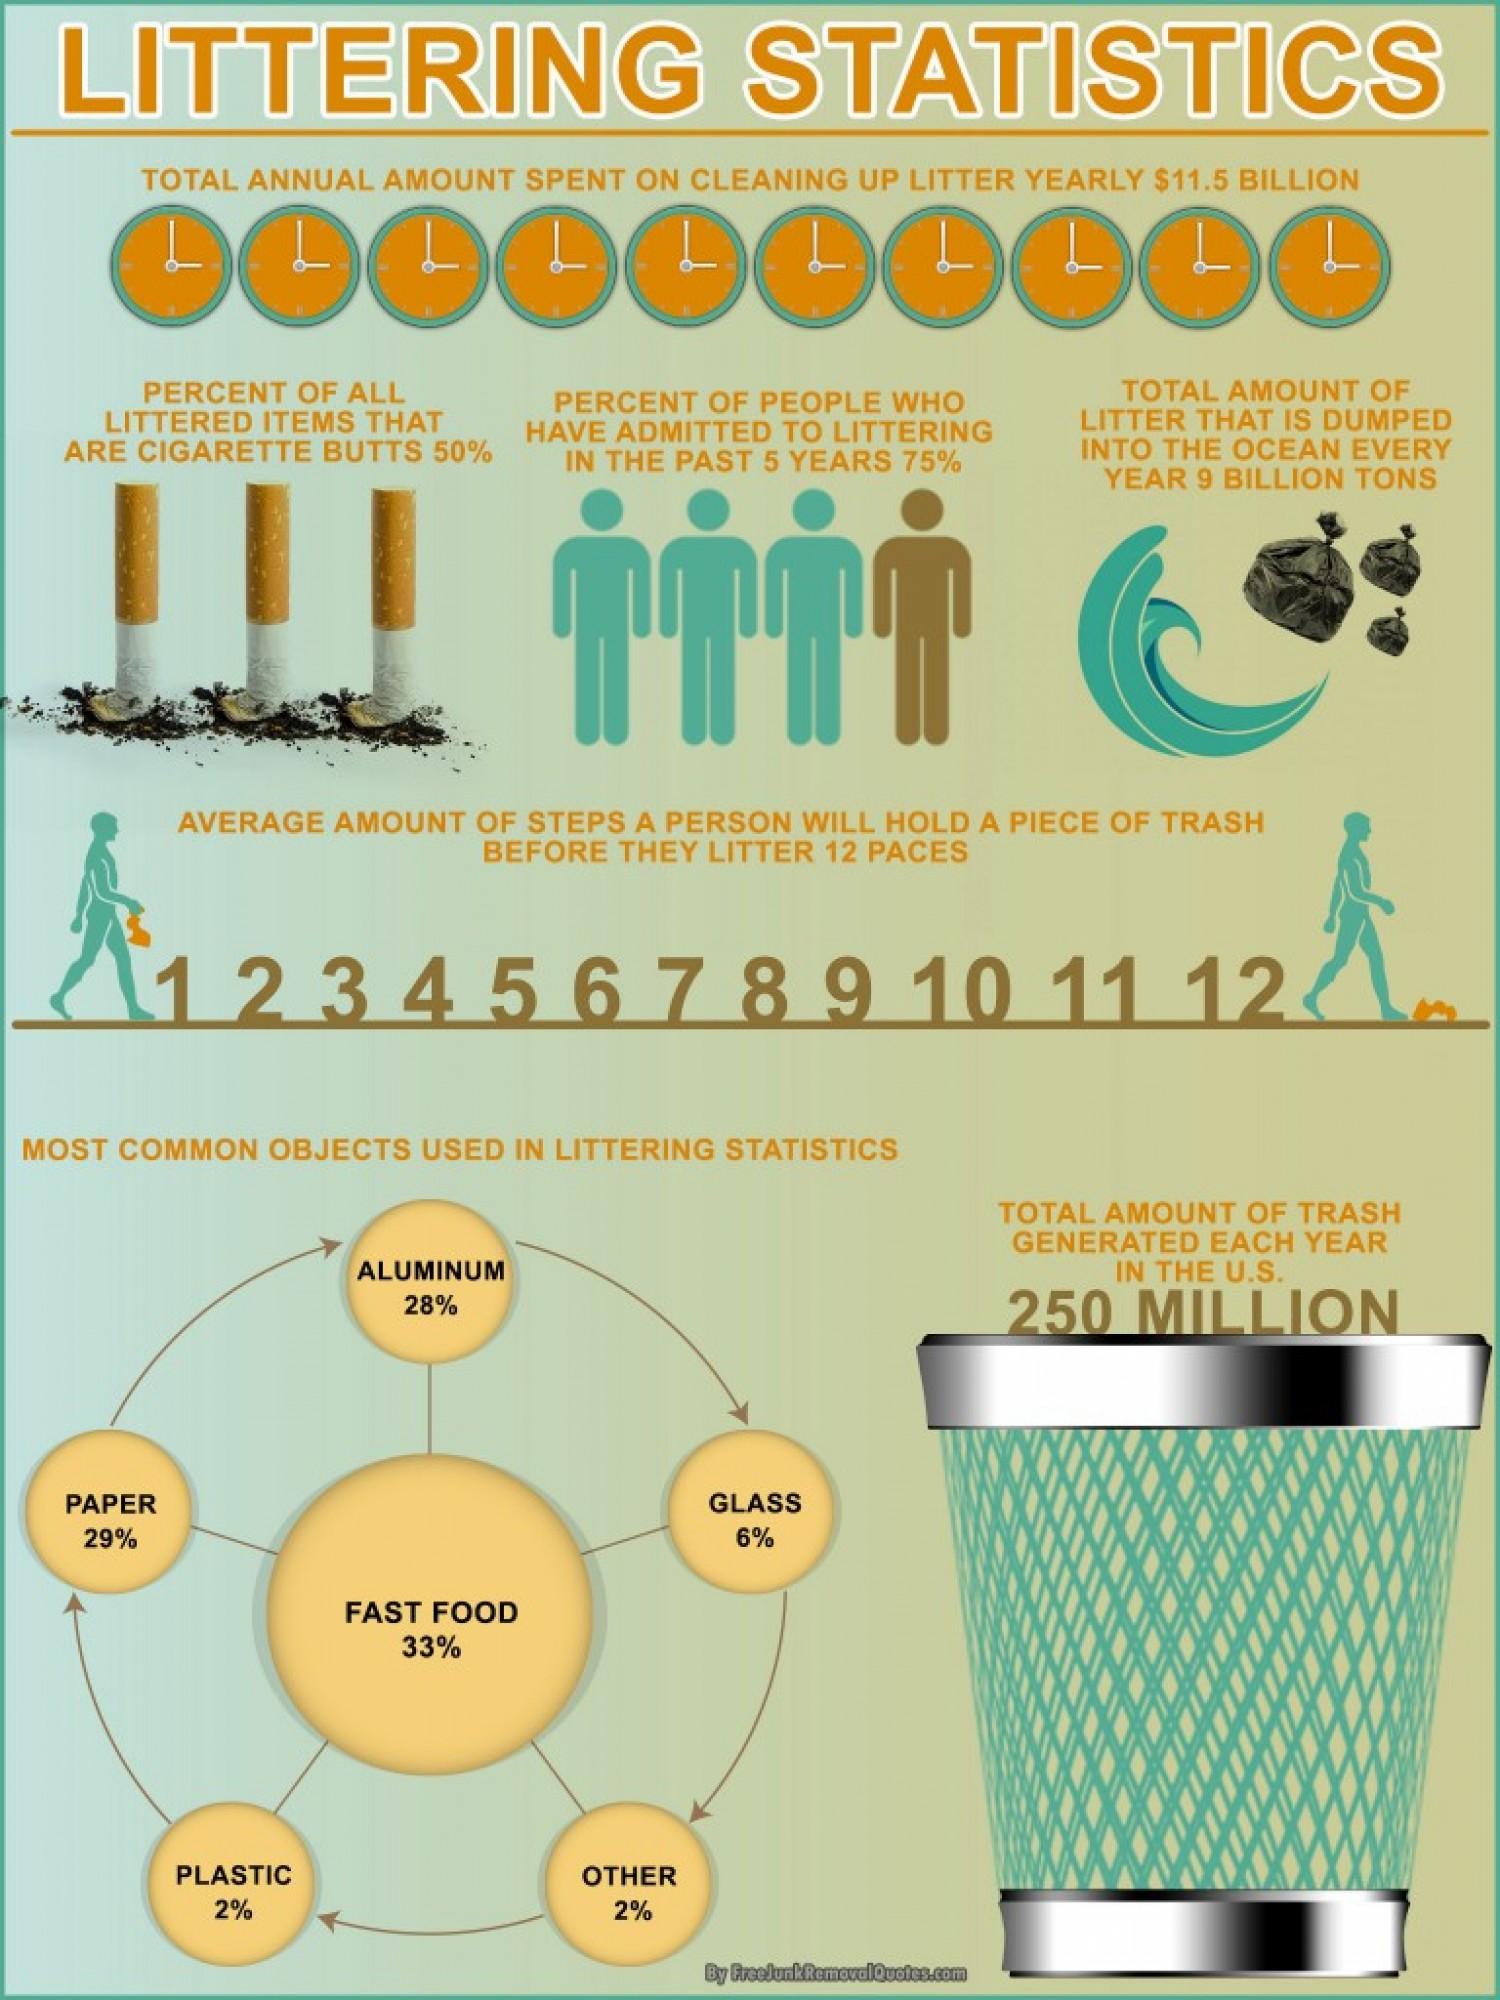 Littering Statistics